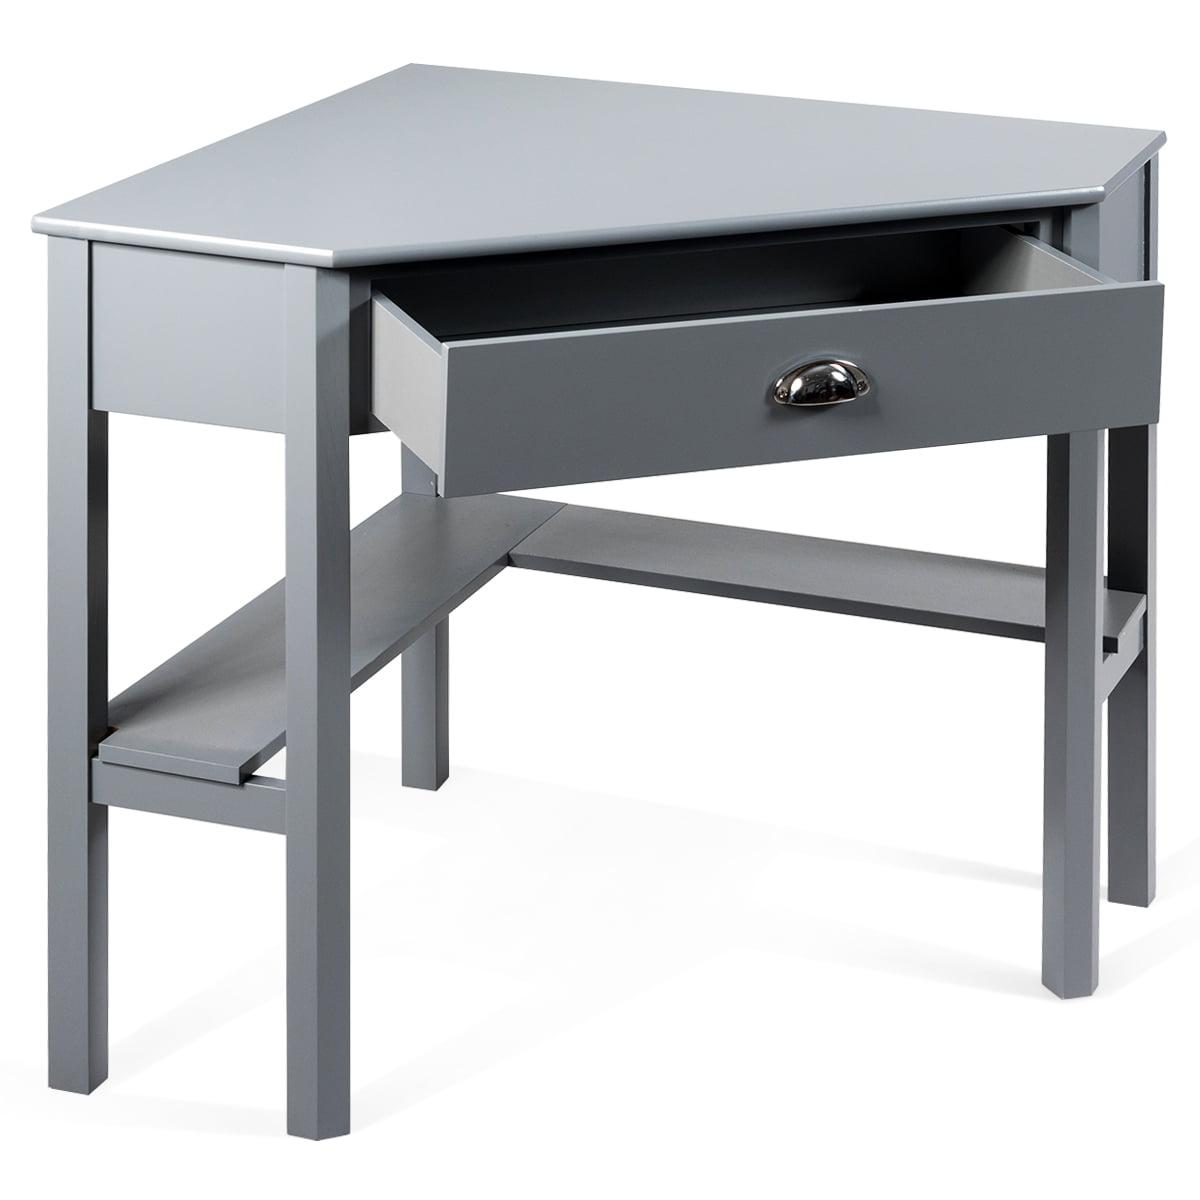 Costway Corner Computer Desk Laptop Writing Table Wood Workstation Home Office Furniture Gray Walmart Com Walmart Com